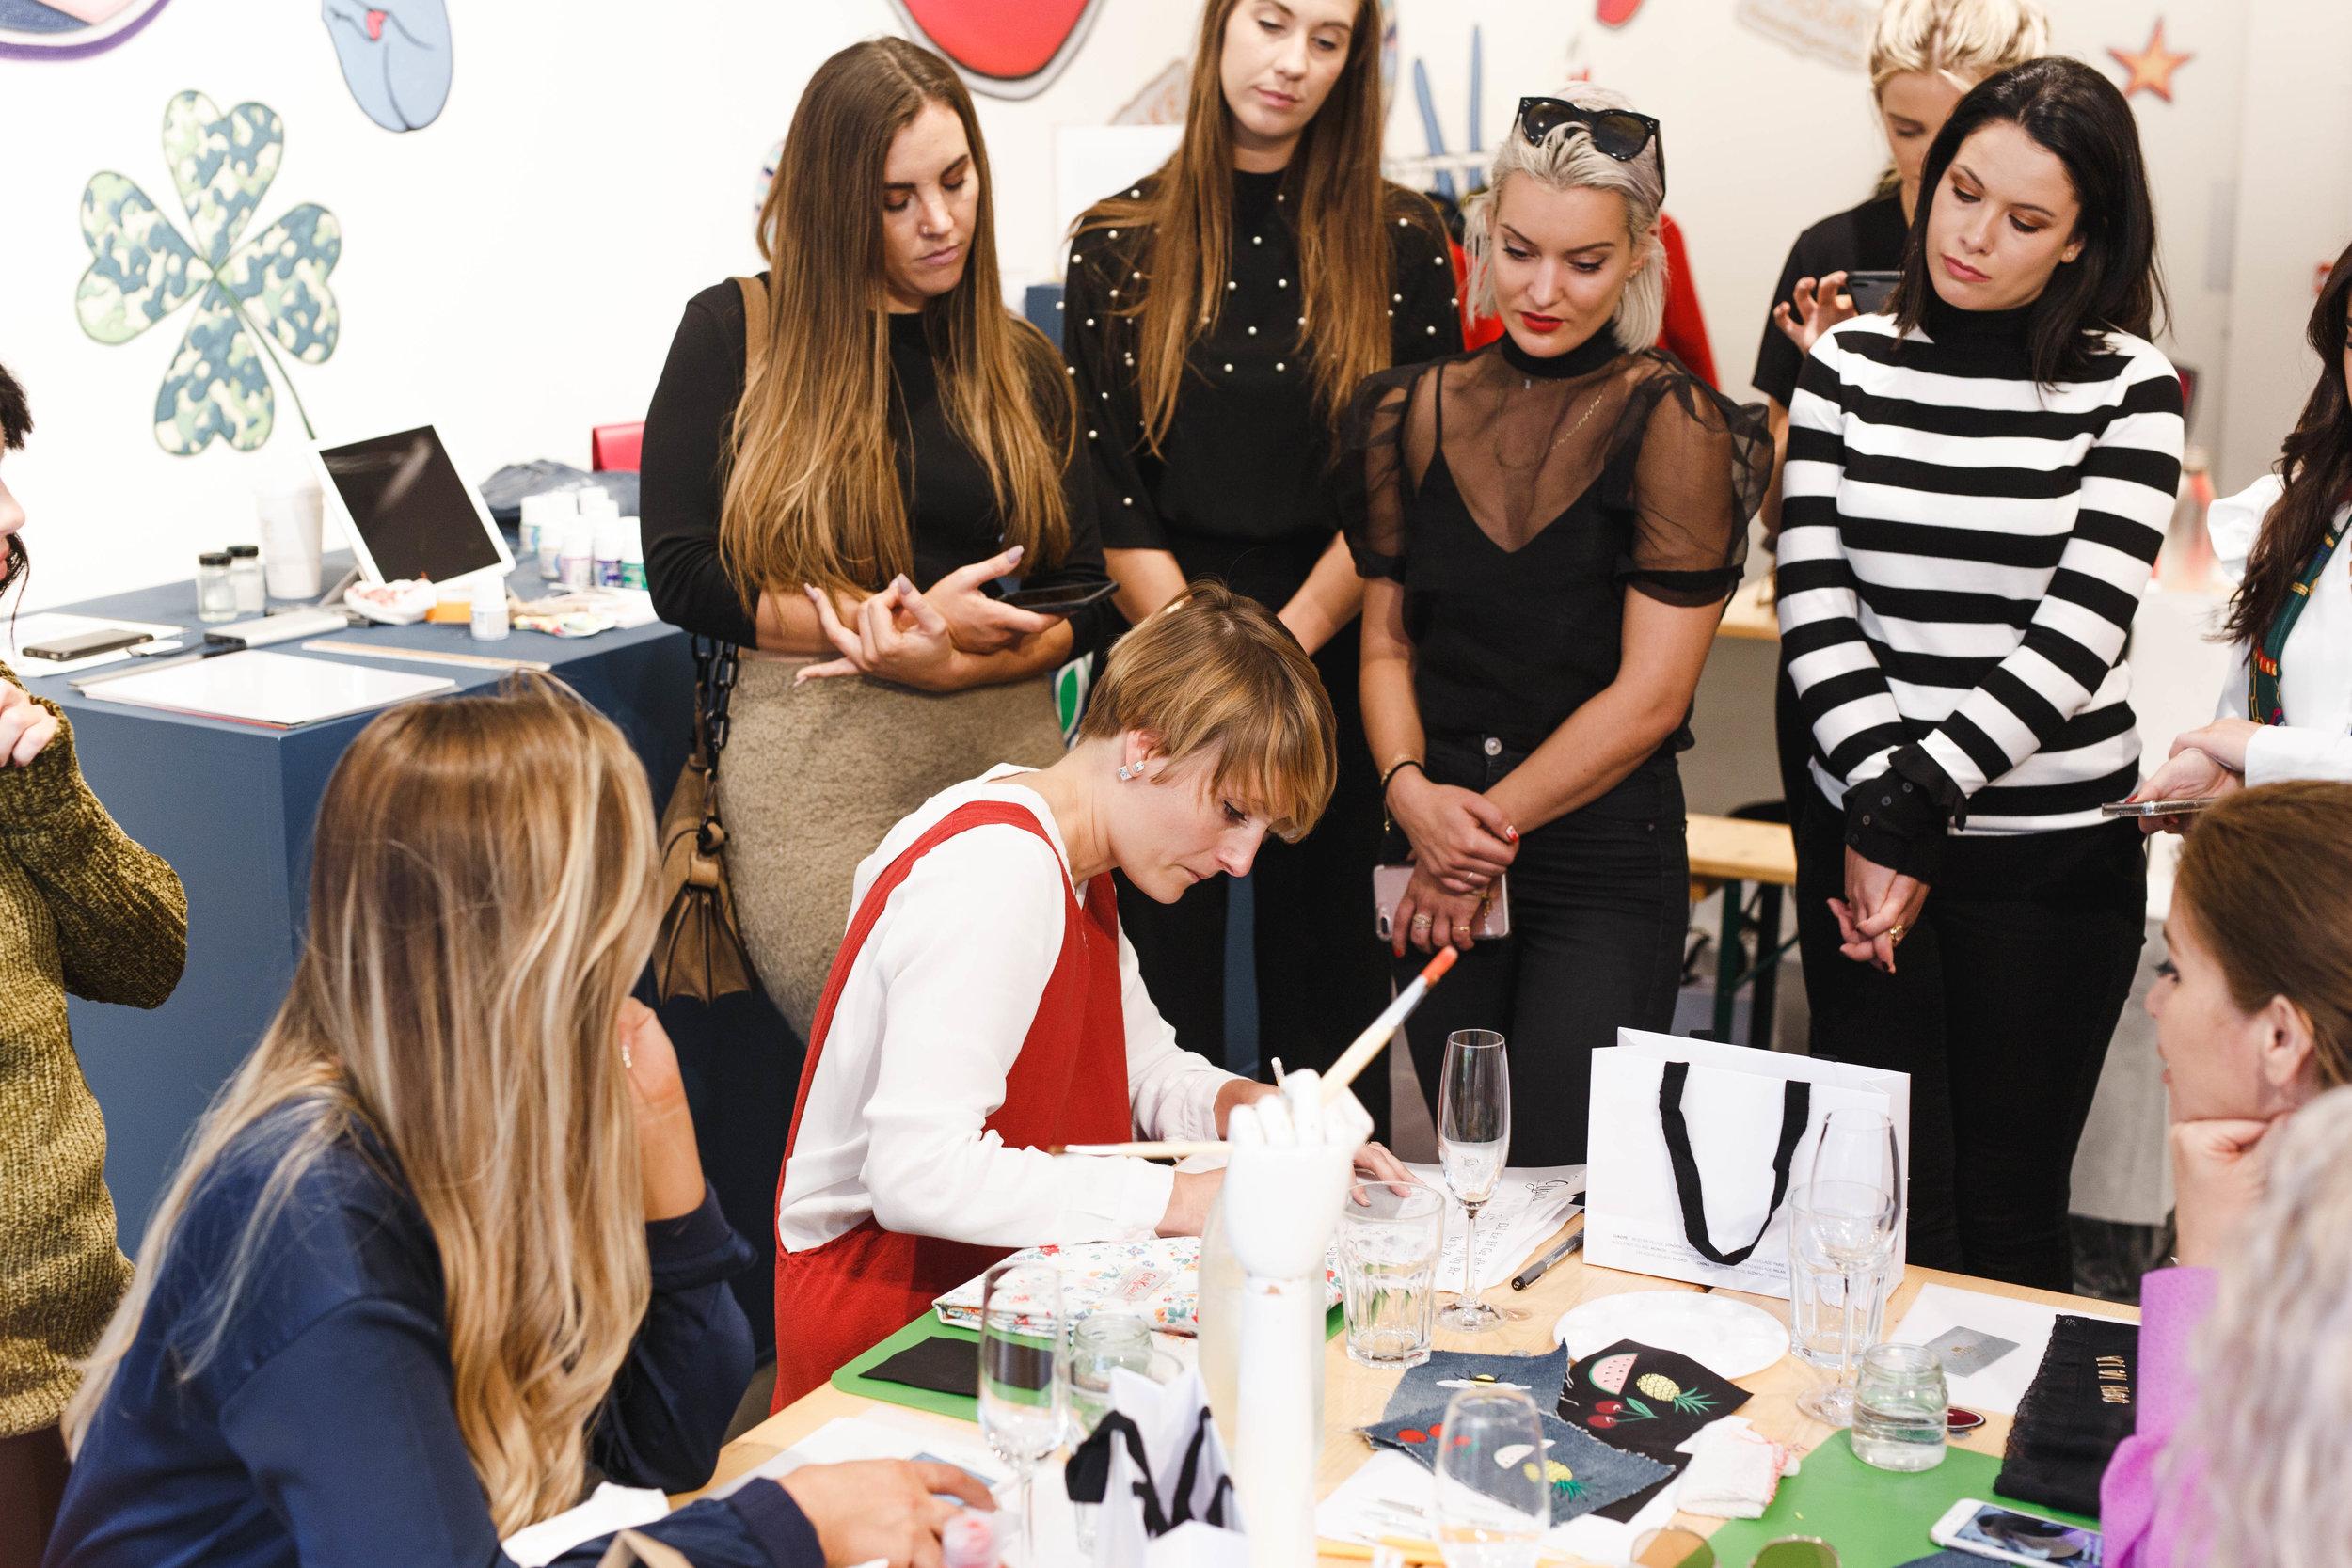 Willa Gebbie Influencer Workshop - Hand painting Leather and Denim